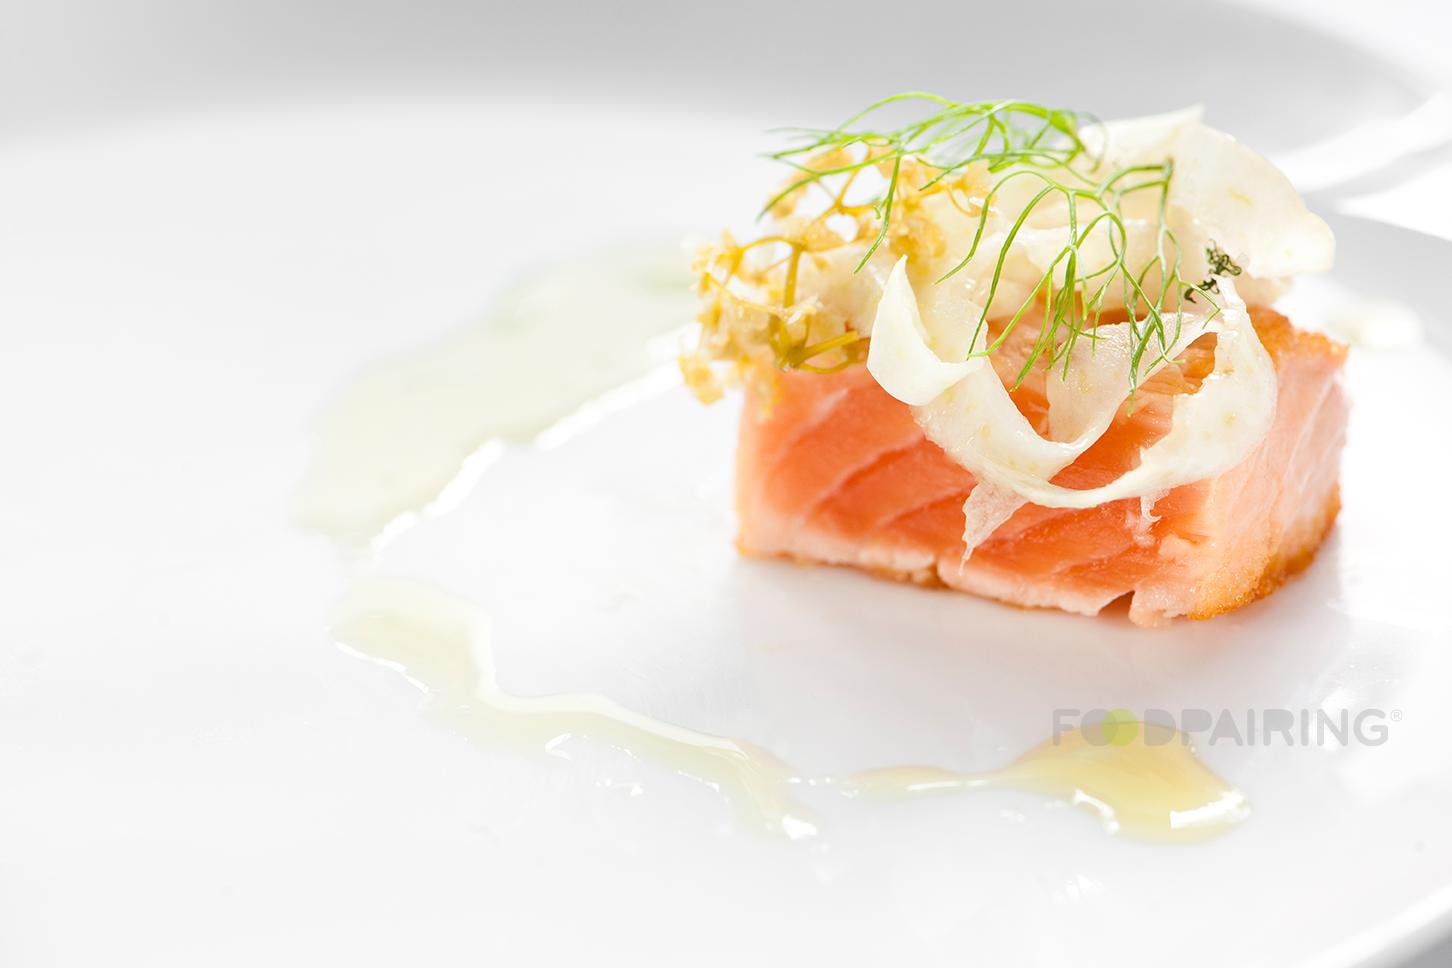 http://blog-assets.foodpairing.com/2017/05/Fennel-Salmon-Elderflower.png